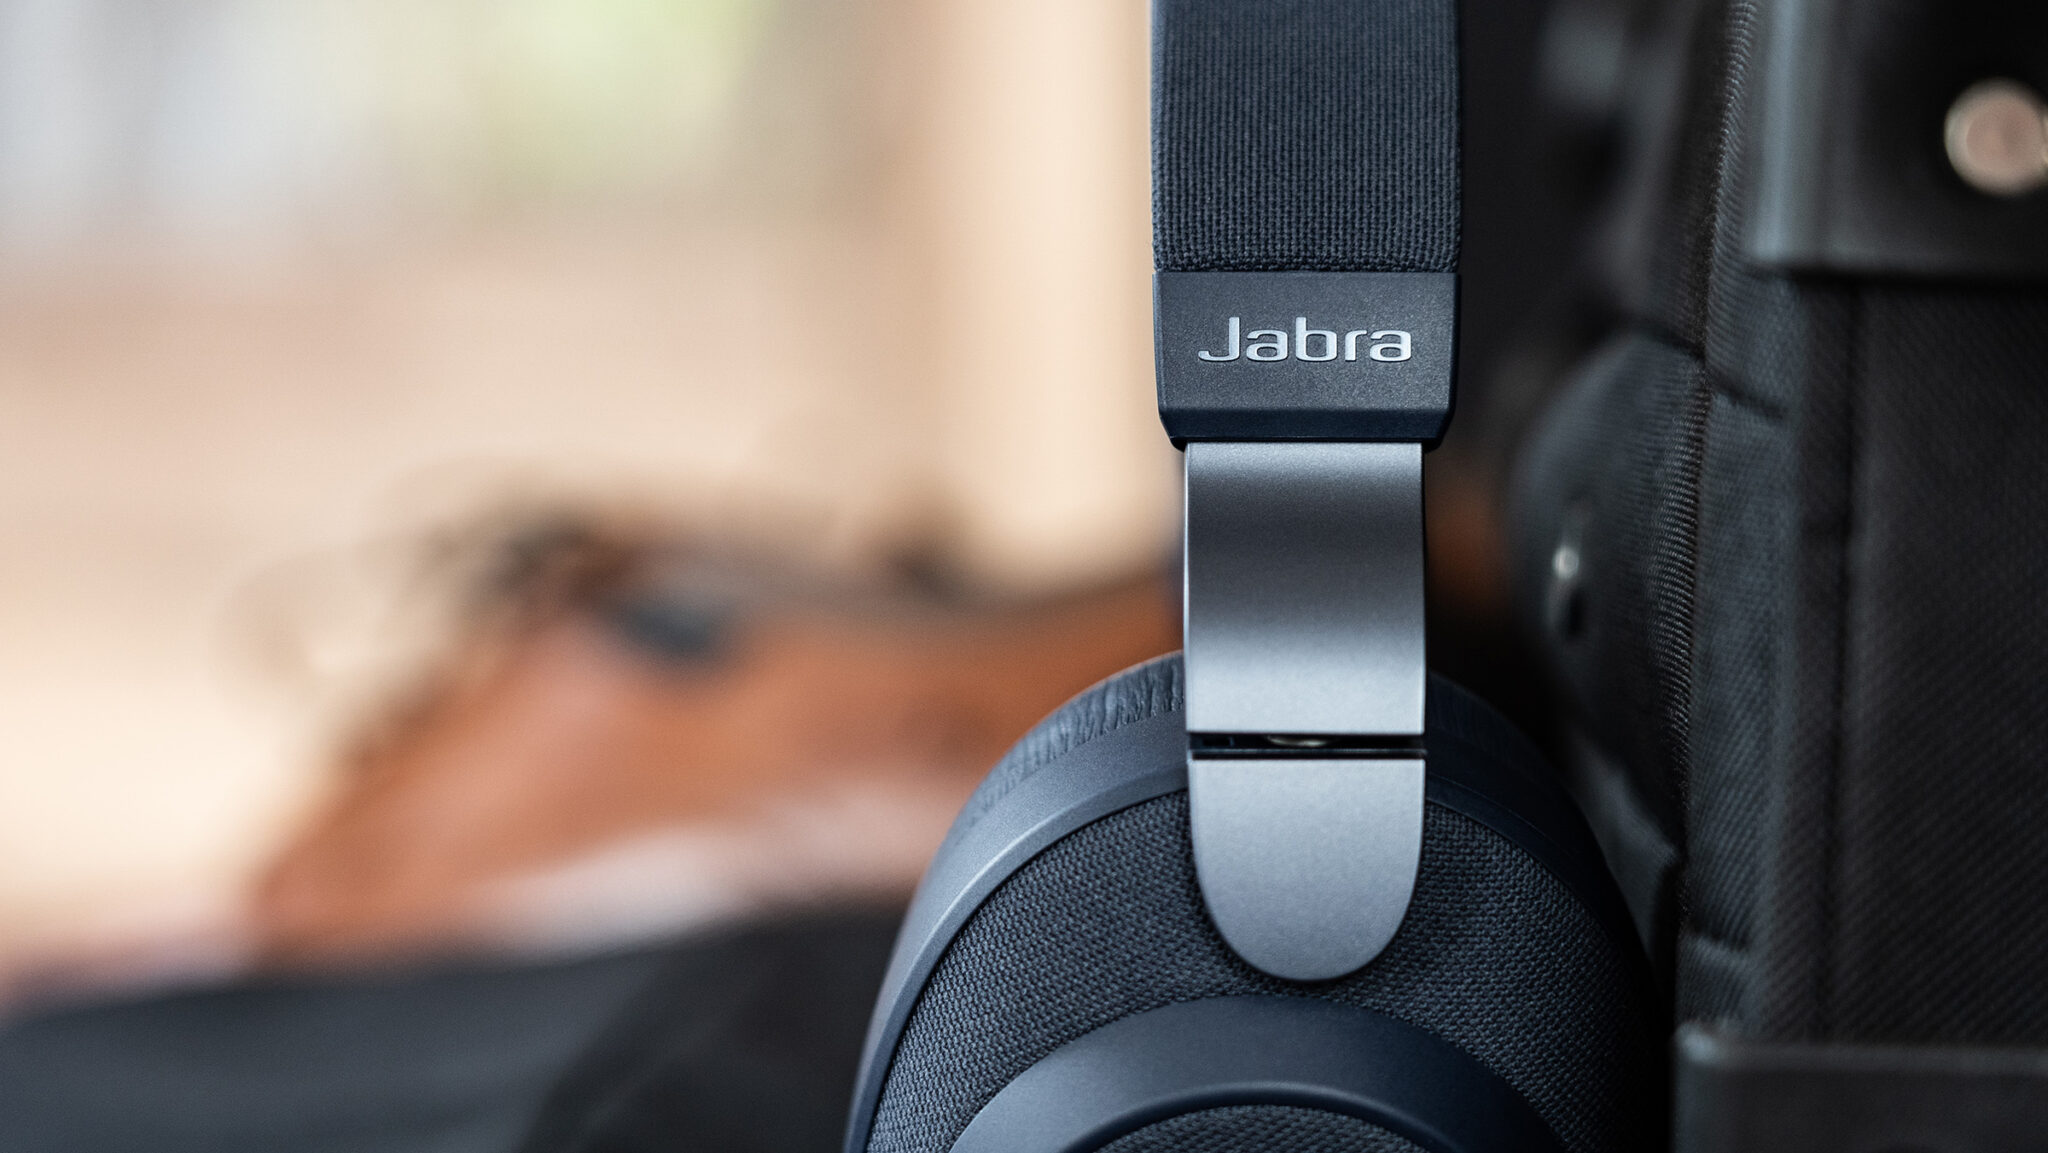 Jabra Elite 85h ANC Headset Details